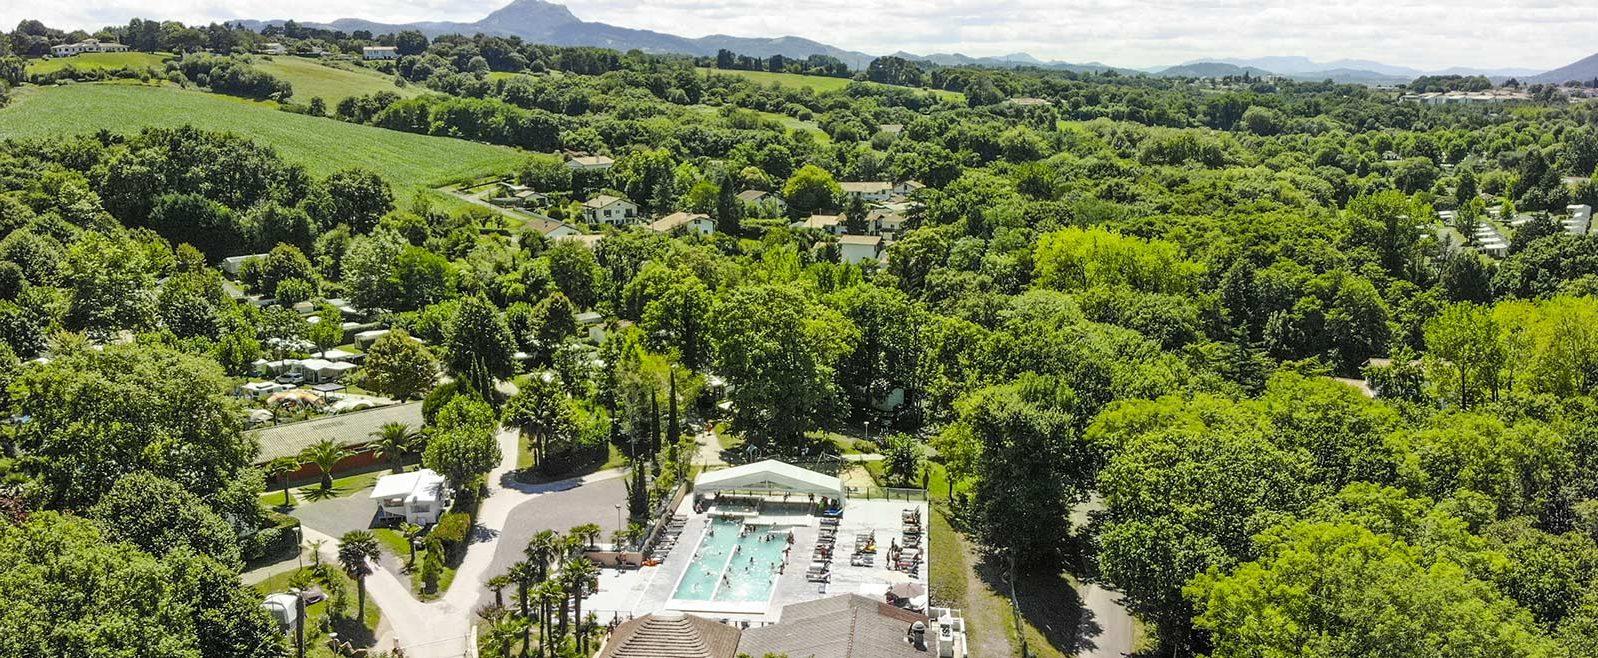 Camping Hendaye | Pays Basque | Camping 4 Étoiles Cote ... serapportantà Camping Pays Basque Piscine Couverte